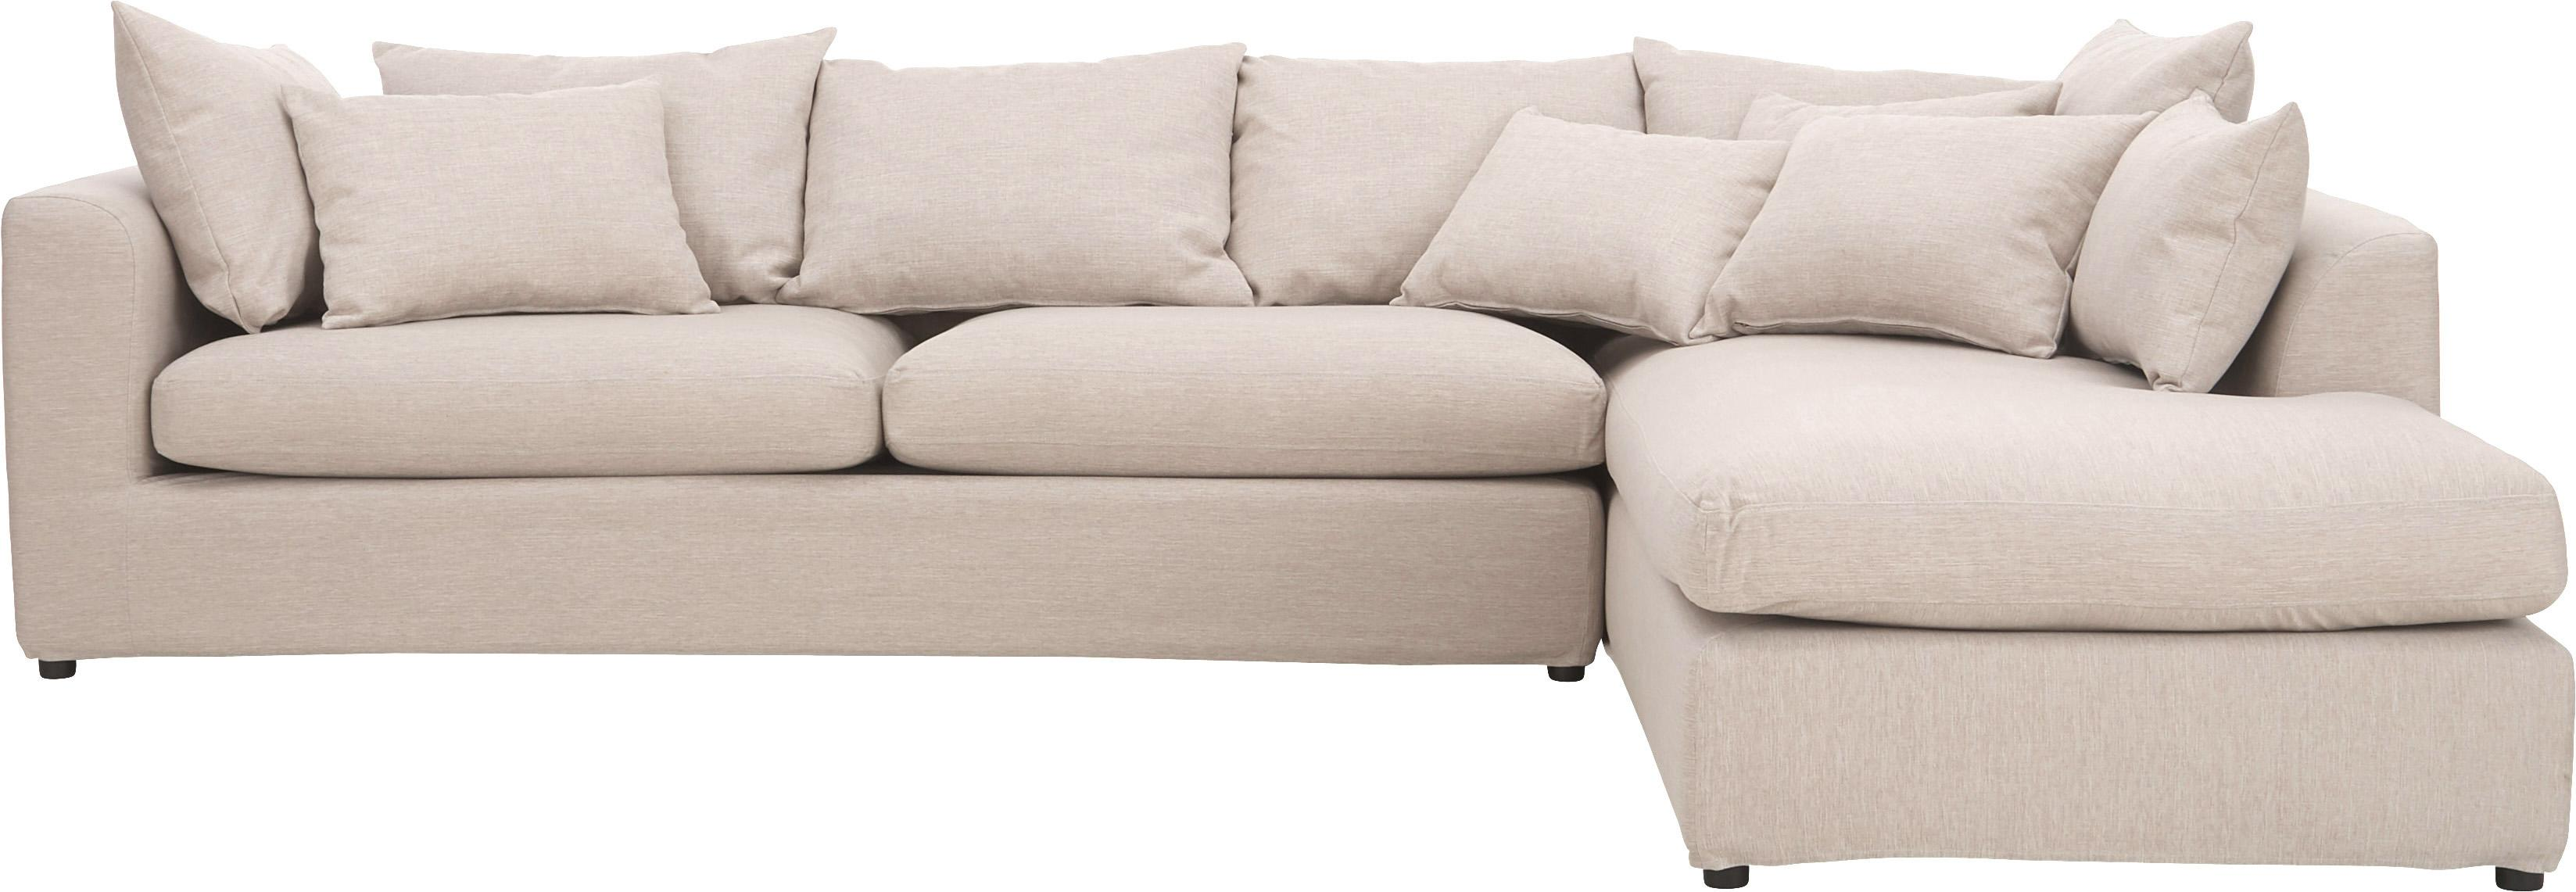 Canapé d'angle Zach, Tissu beige